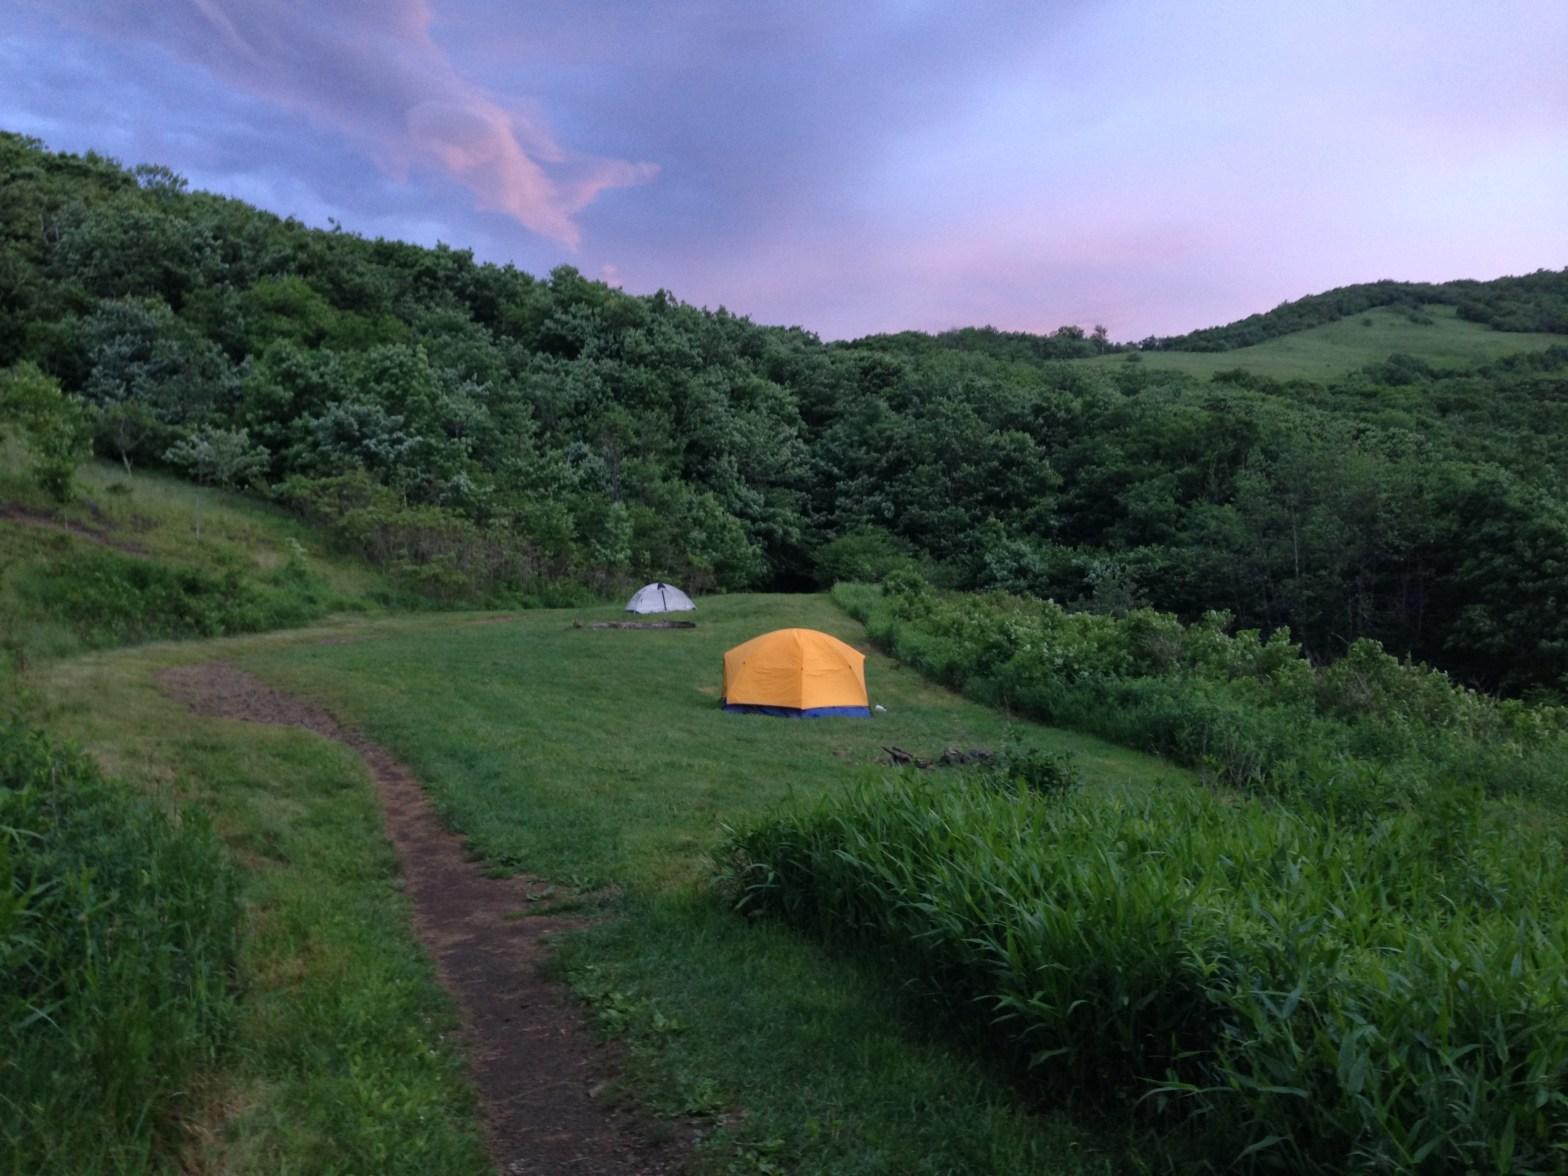 Camping along the Appalachian Trail.